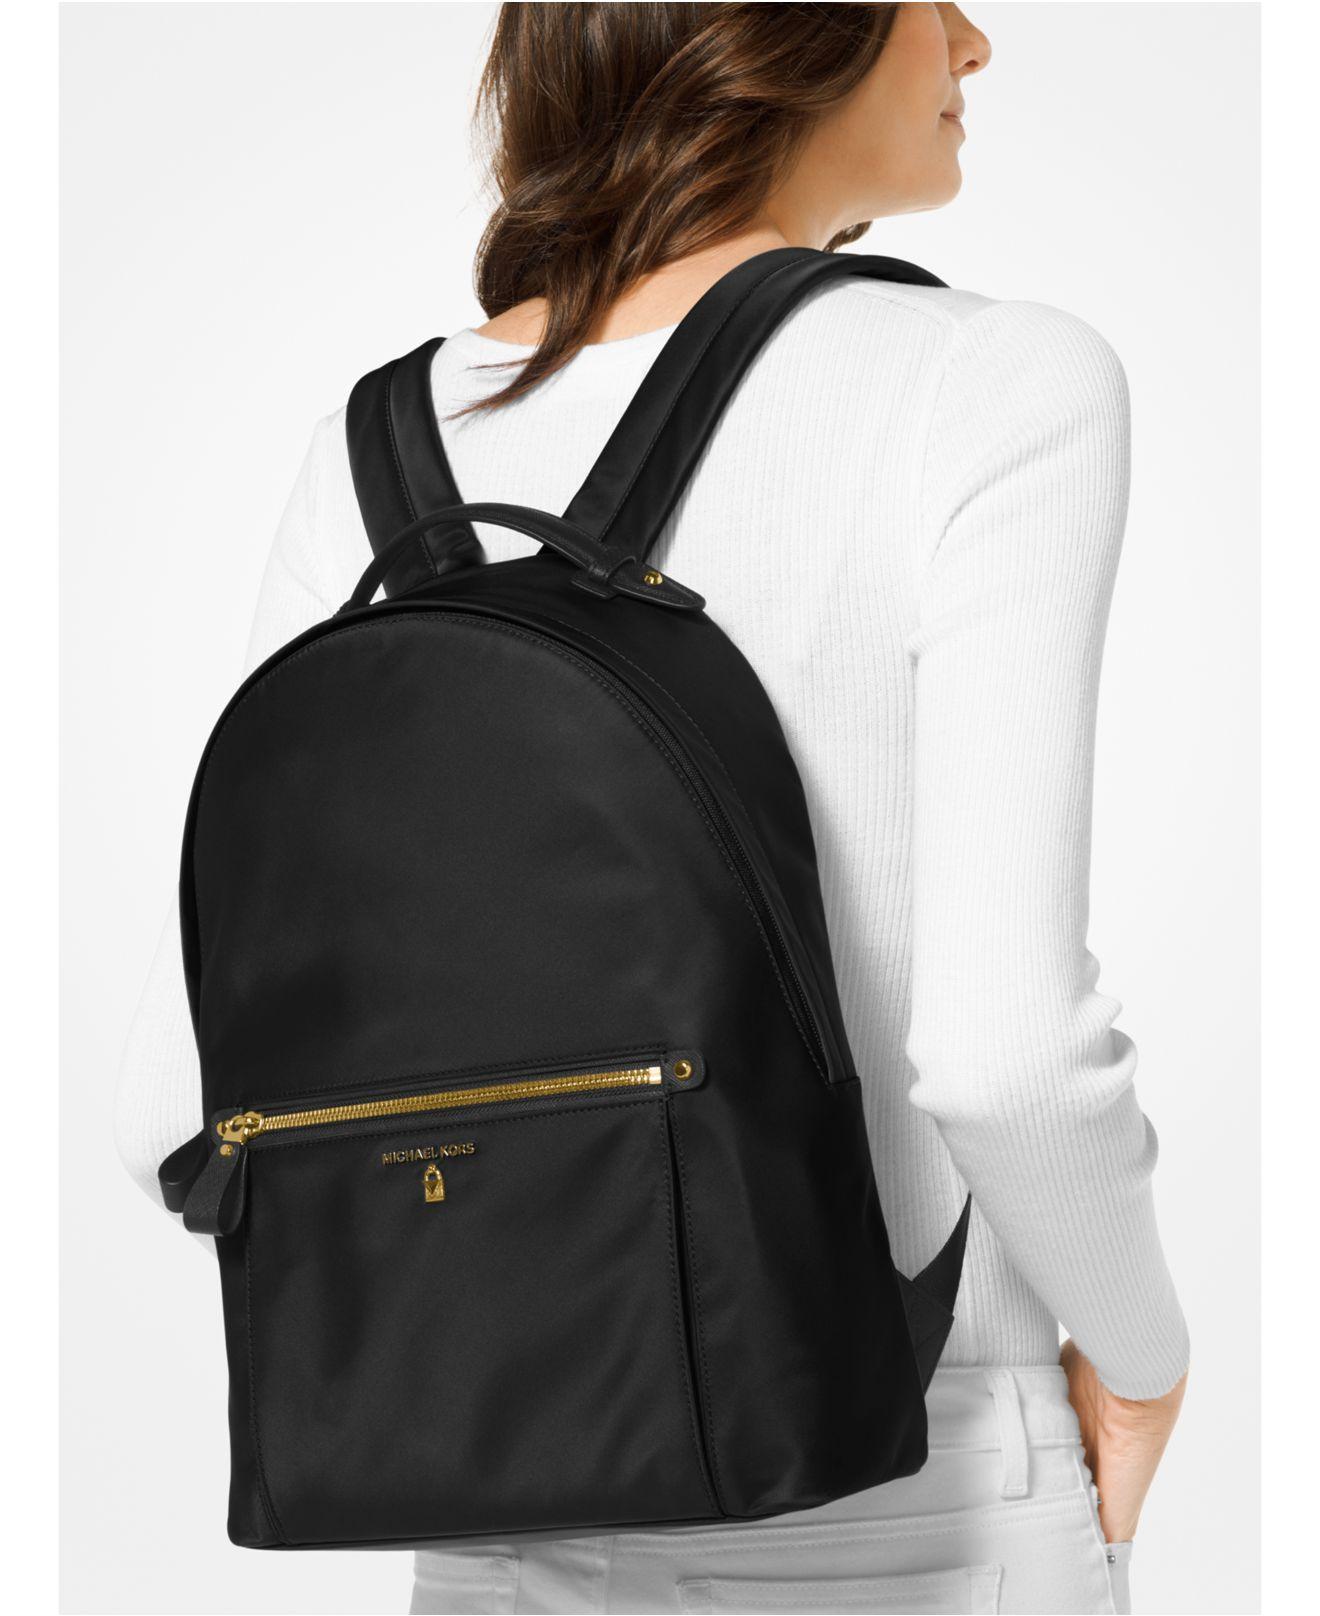 91f651000180 MICHAEL Michael Kors Kelsey Nylon Backpack in Black - Save 6% - Lyst